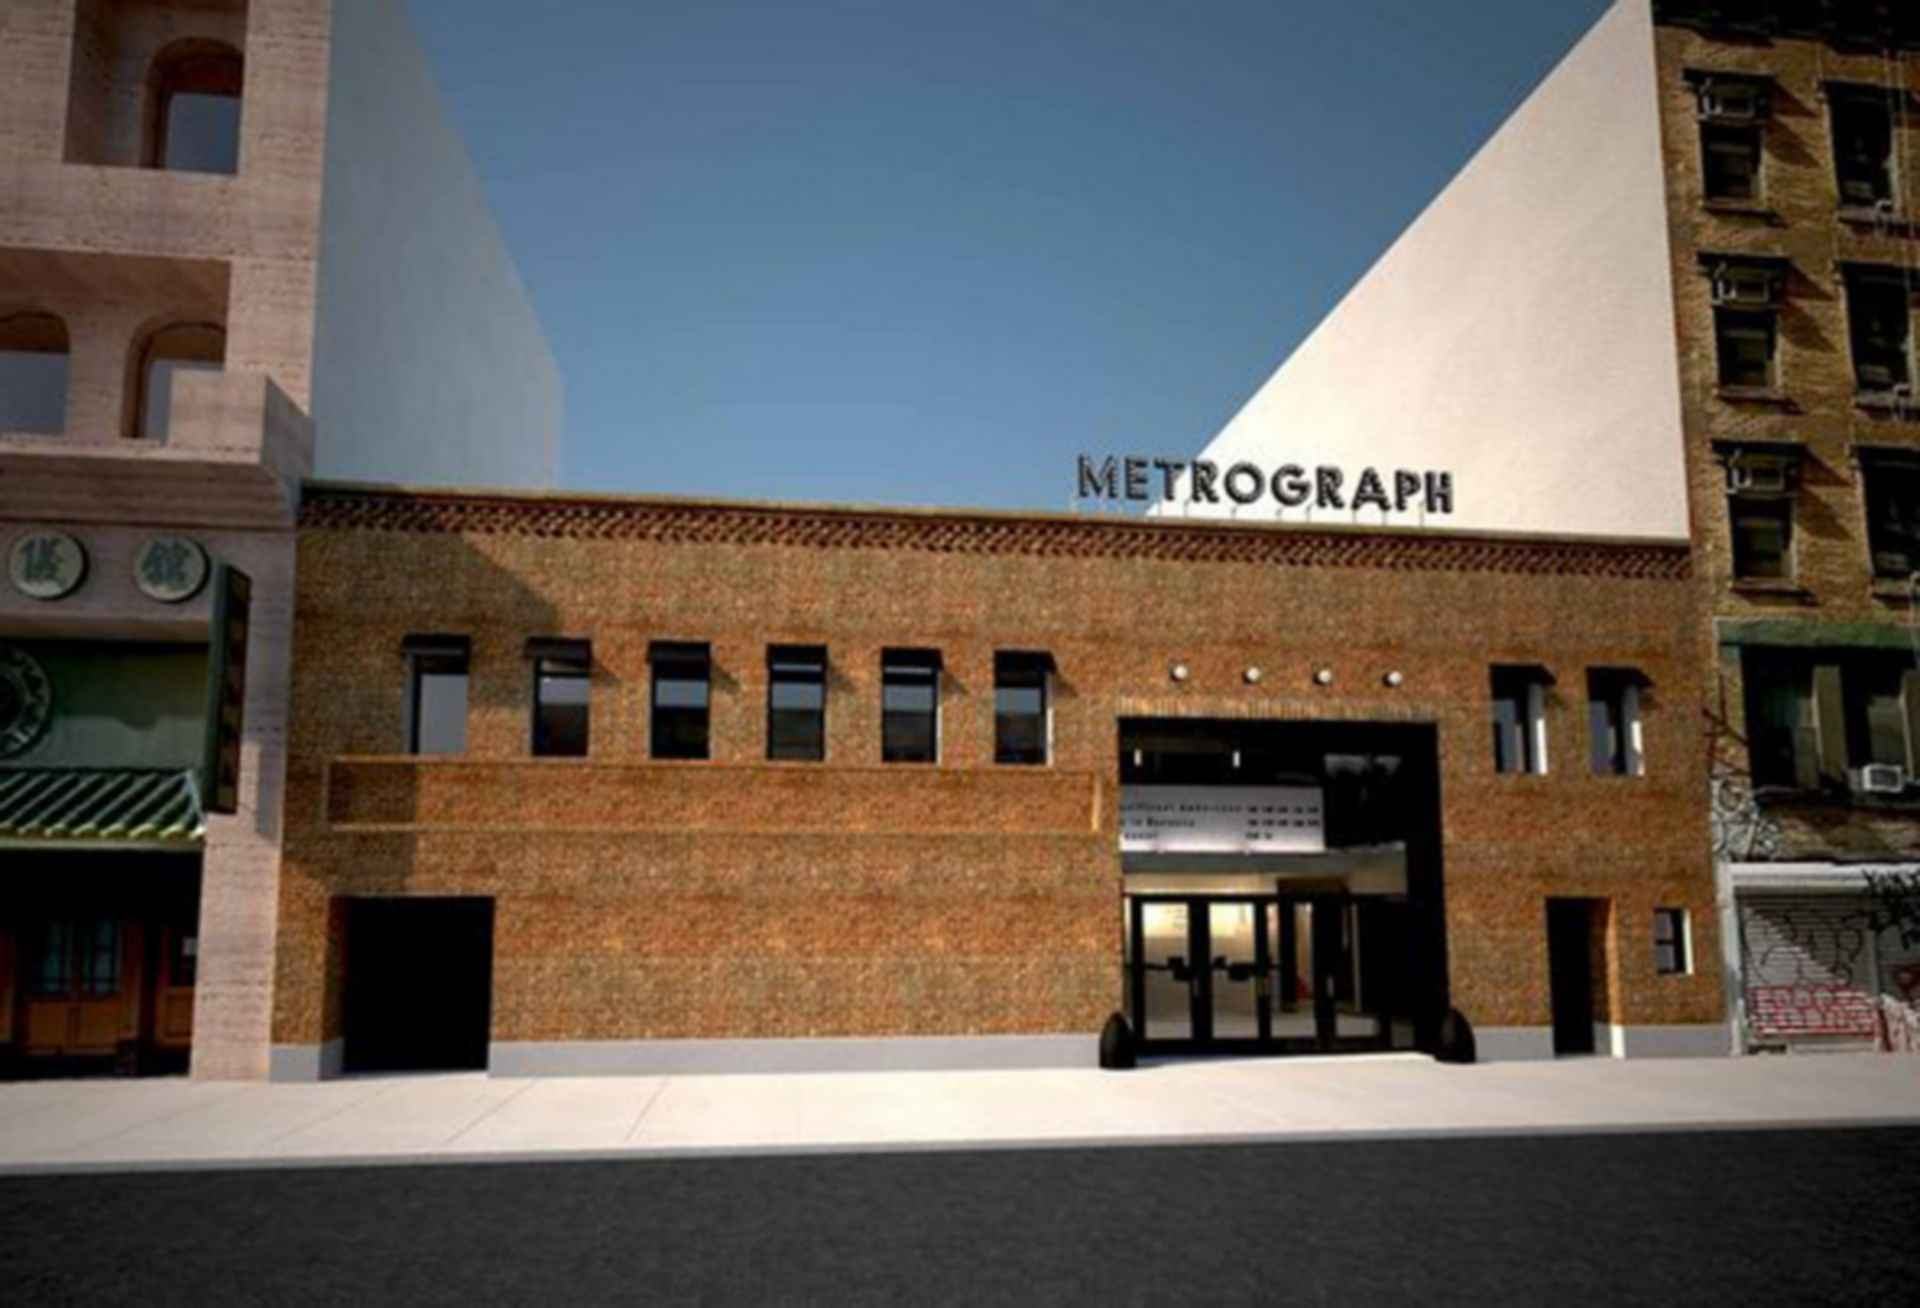 Metrograph Indie Cinema - street view facade